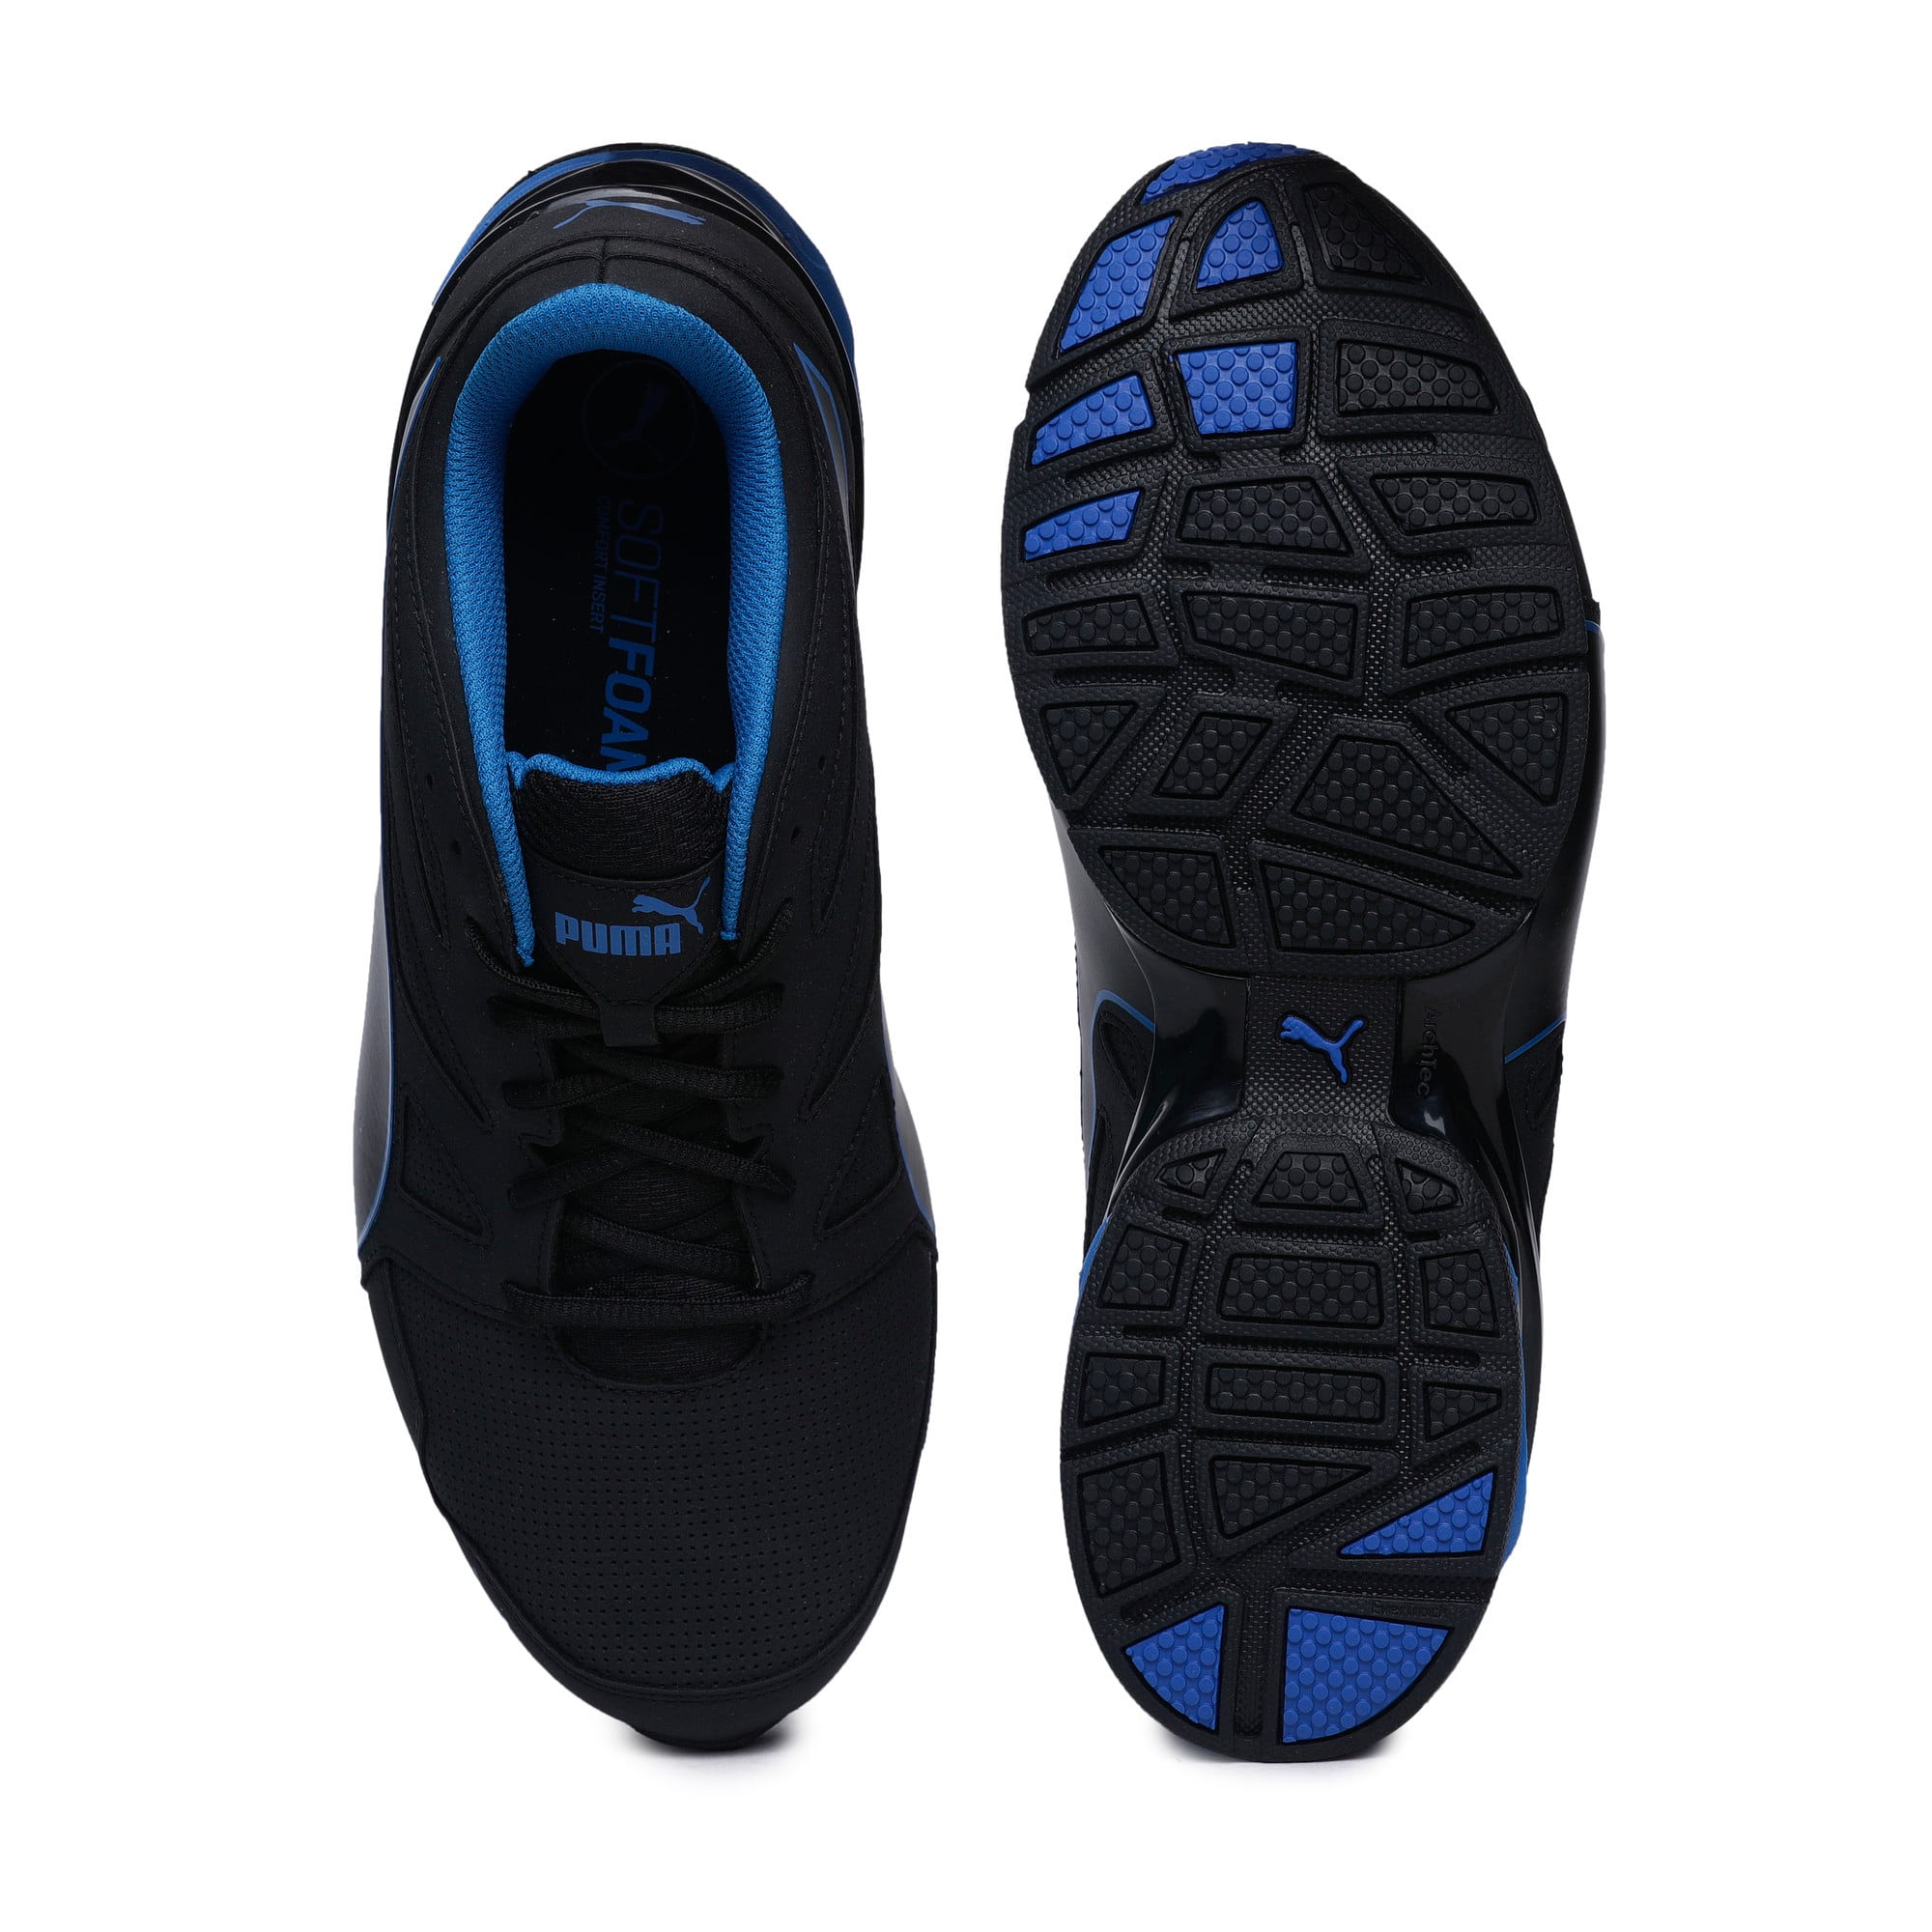 Thumbnail 3 of Tazon Modern SL Men's Running Shoes, Puma Black-Lapis Blue, medium-IND